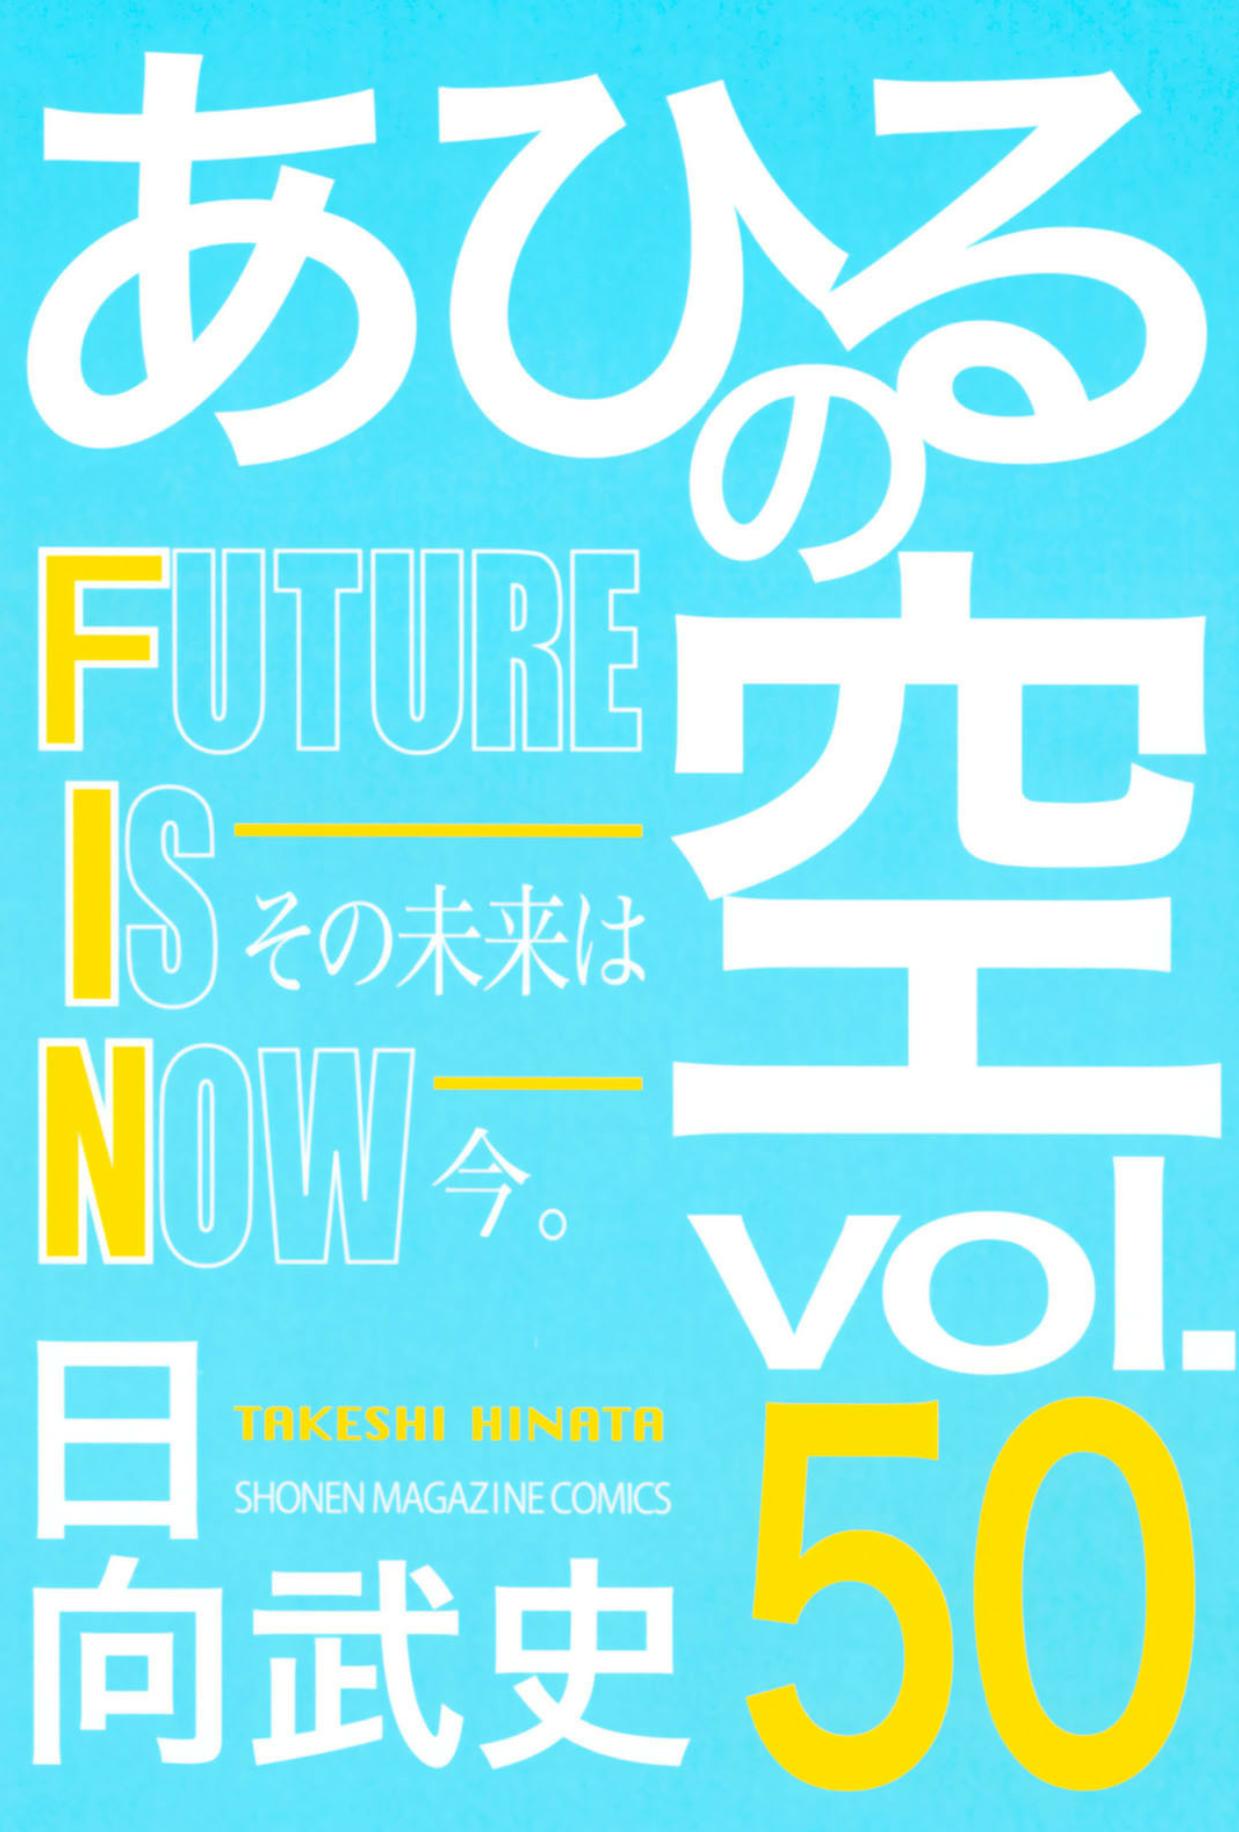 Volume 50